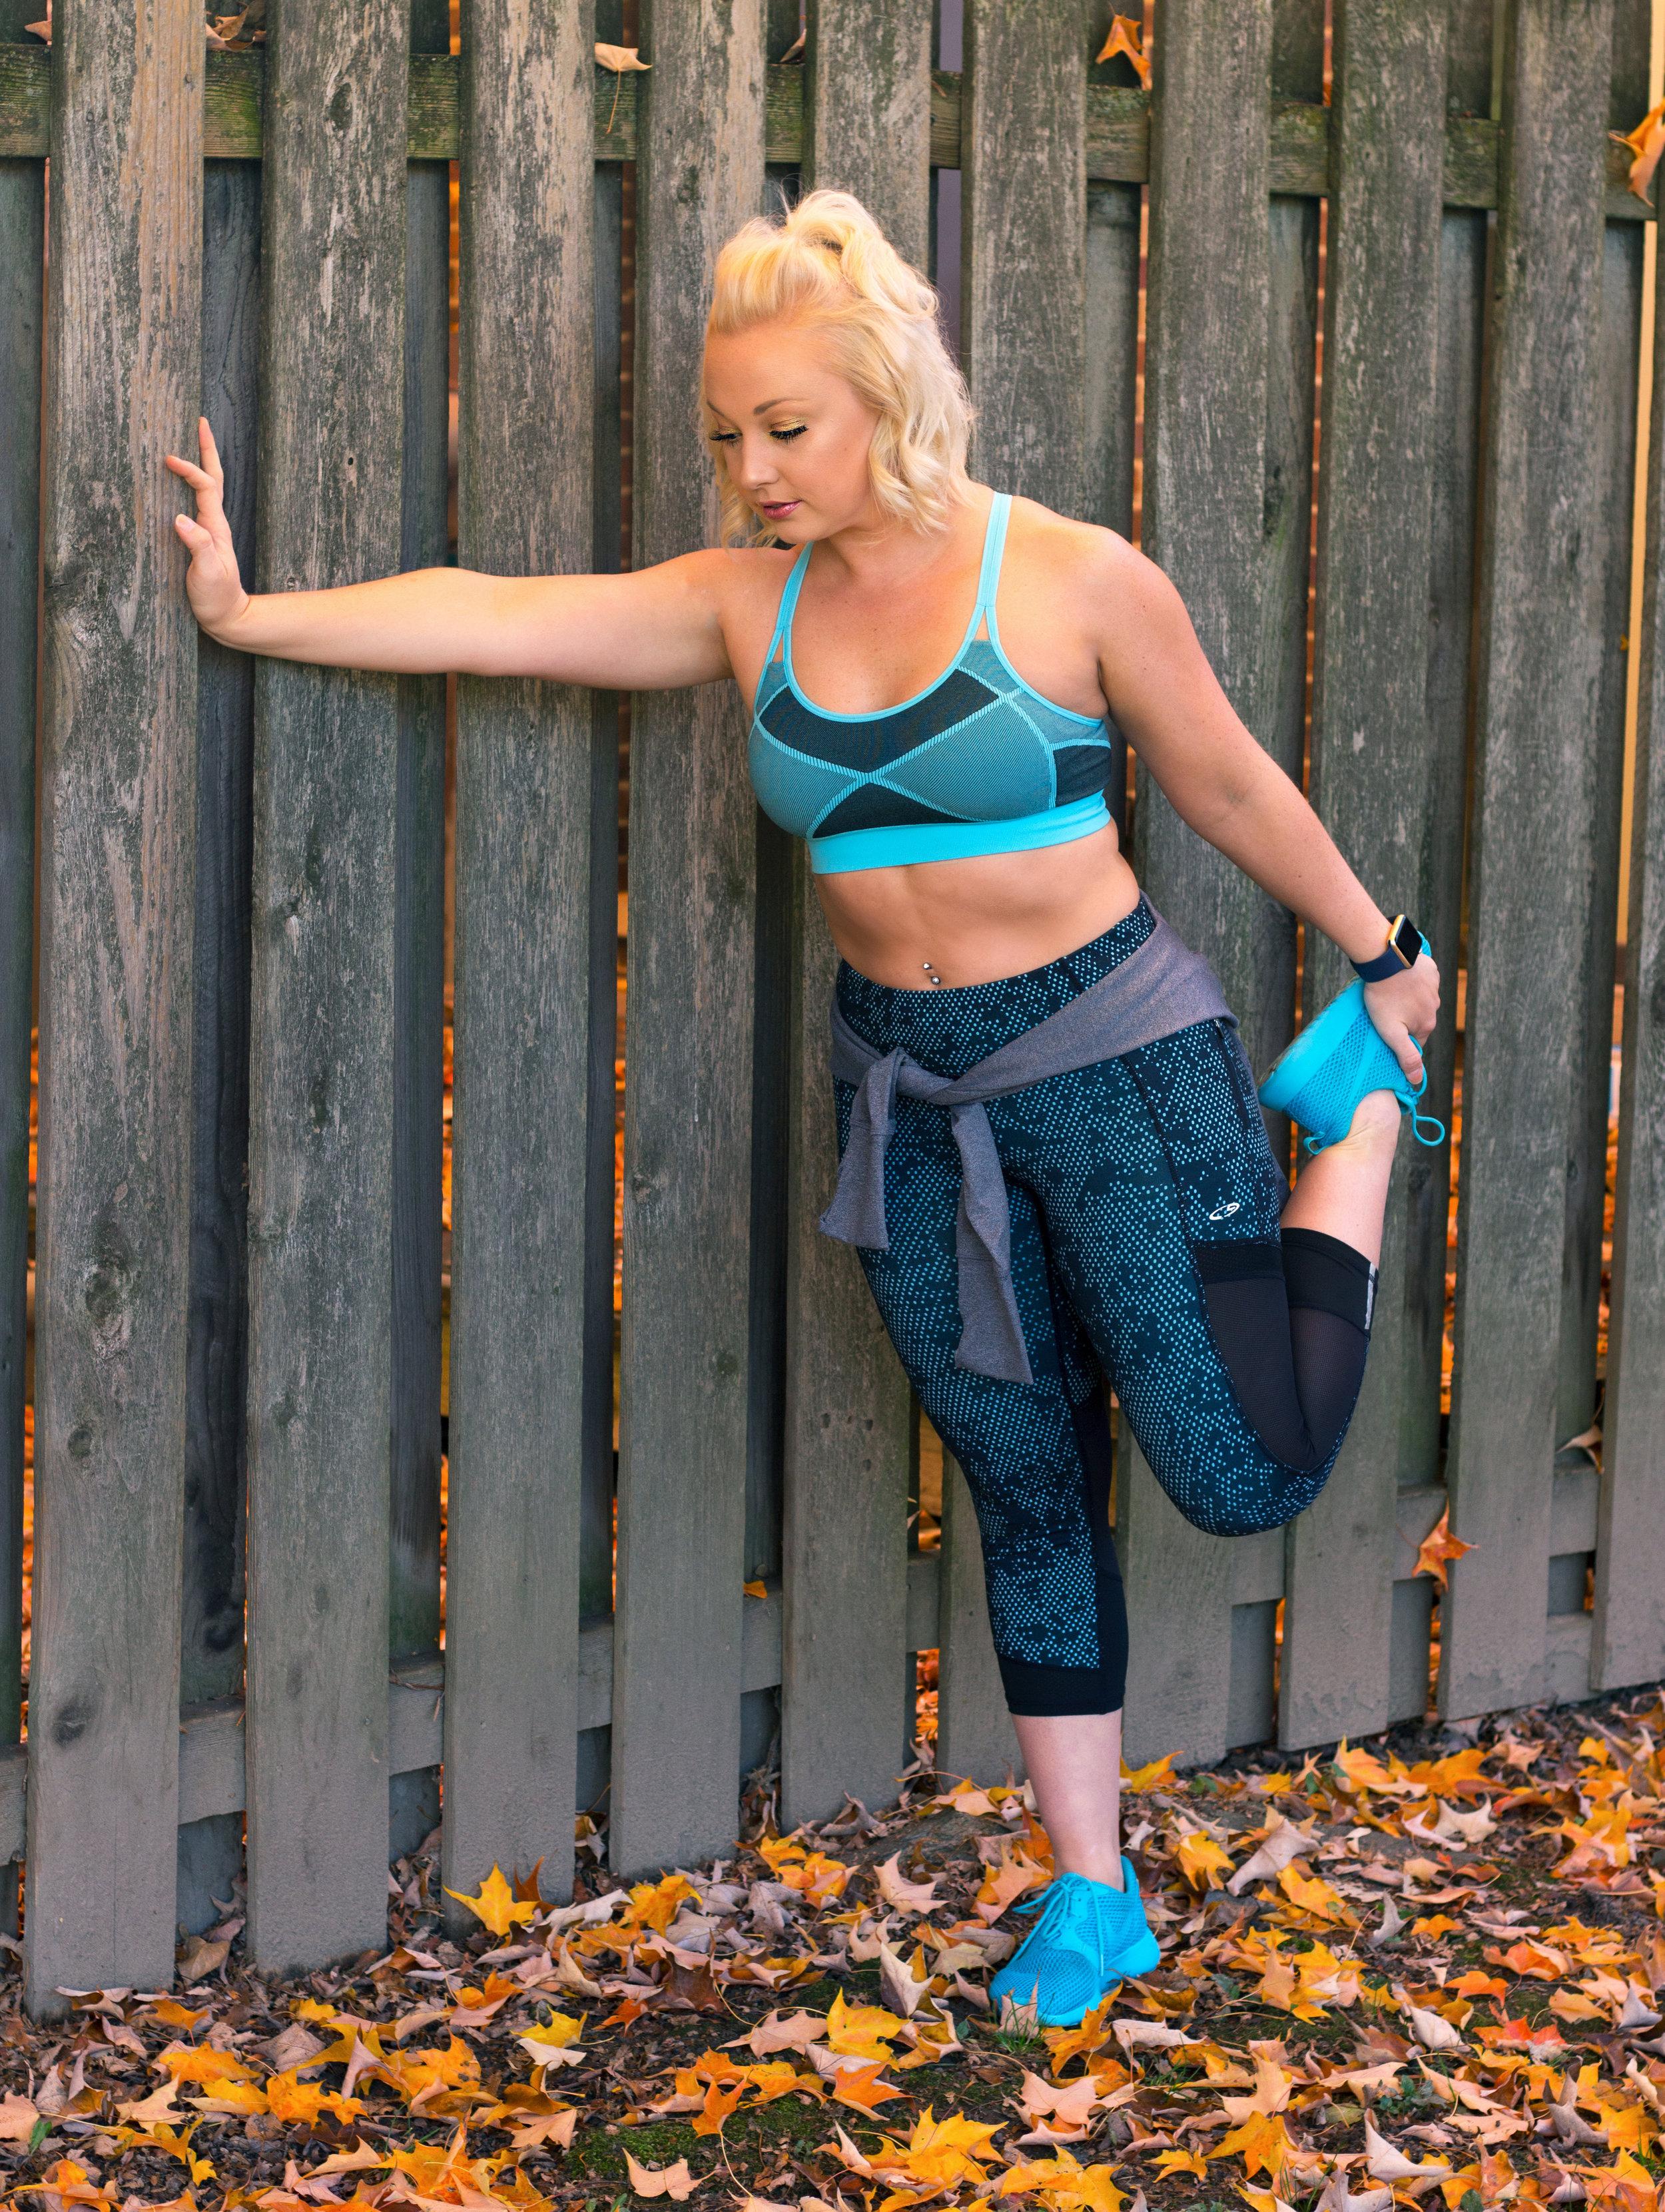 Emily Essentially | Lifestyle | Body Transformation Journey: My Start 2